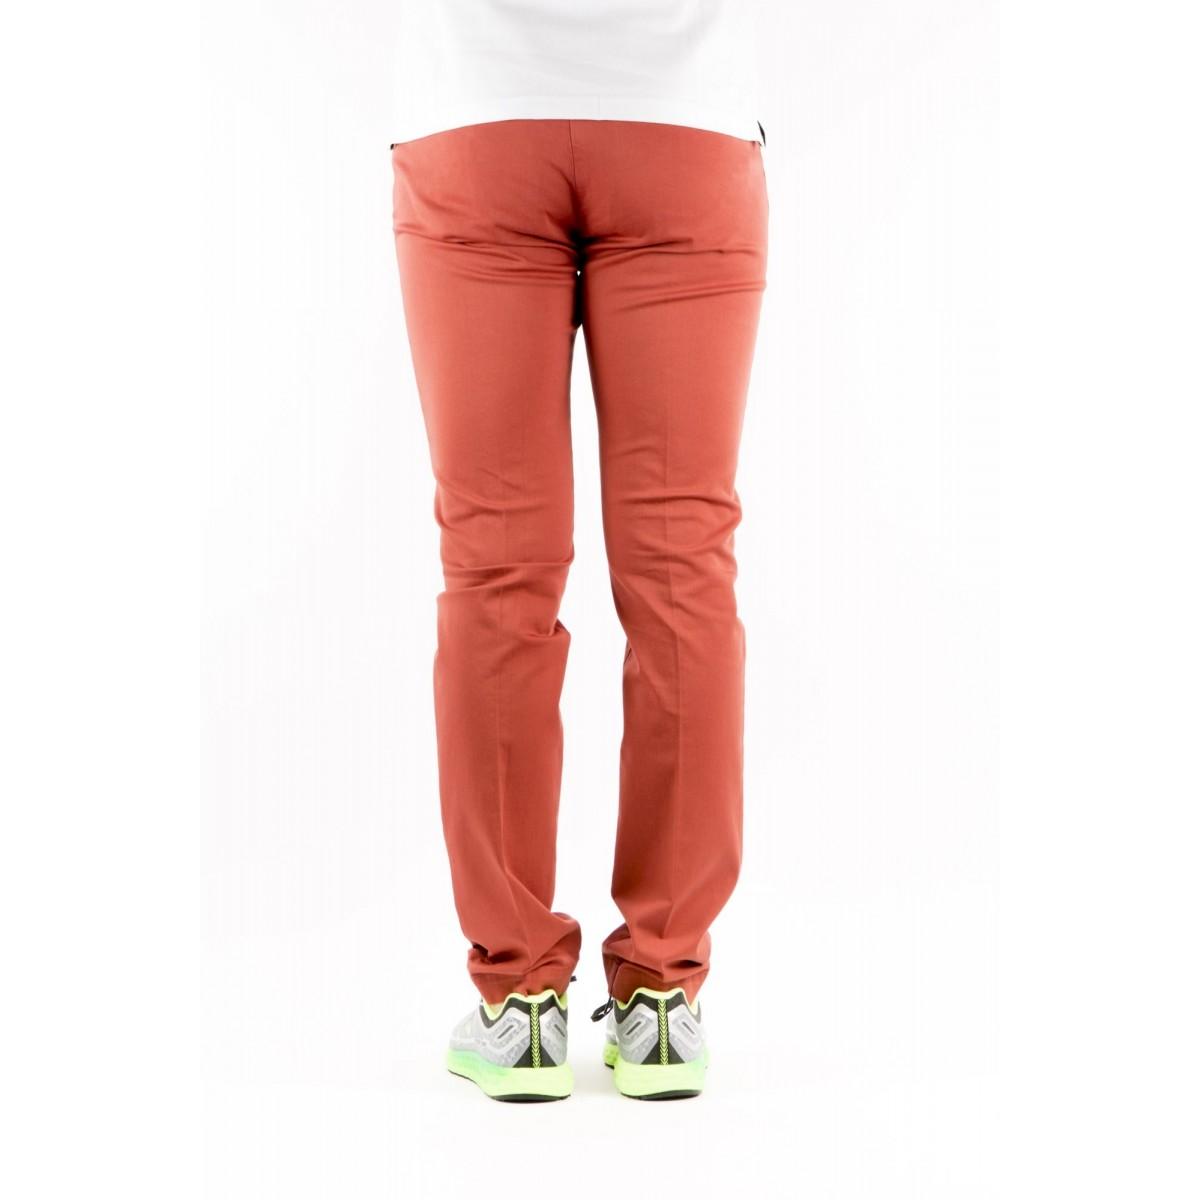 Trousers Entre Amis - 8201 292L17 Gabardina Strech 0802 - mattone